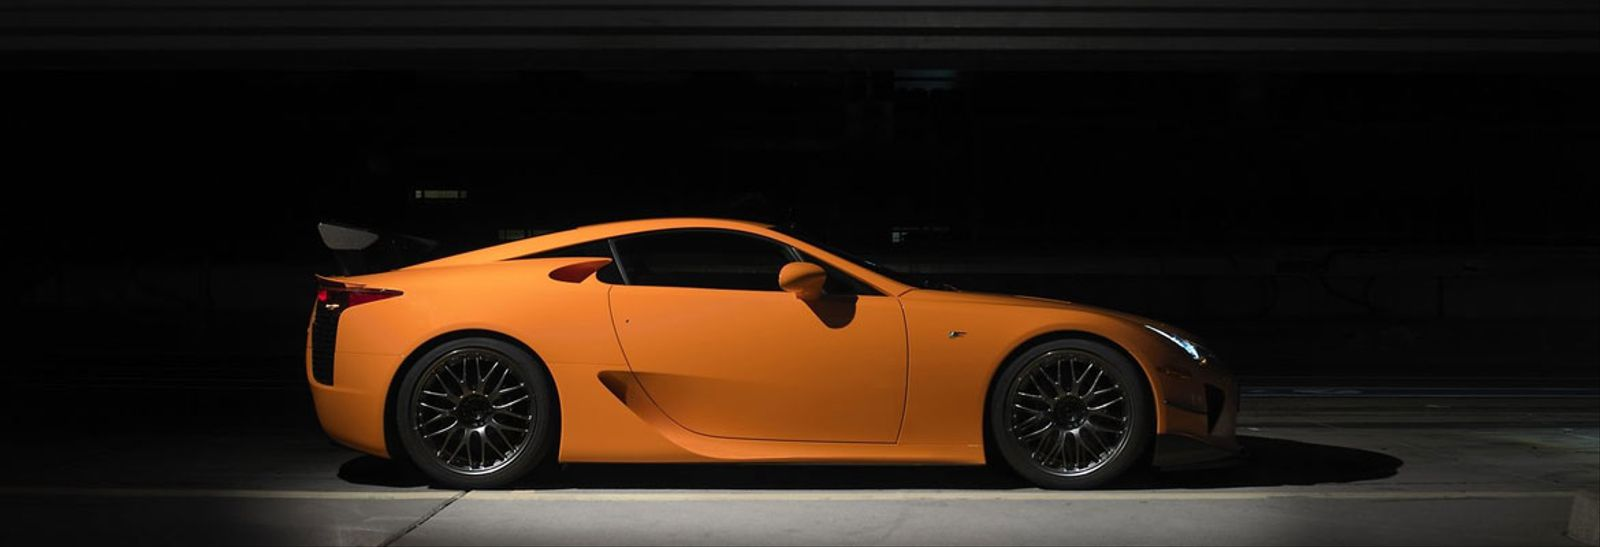 Indy Luxury Motorsports >> Home Indy Luxury Motorsports Llc